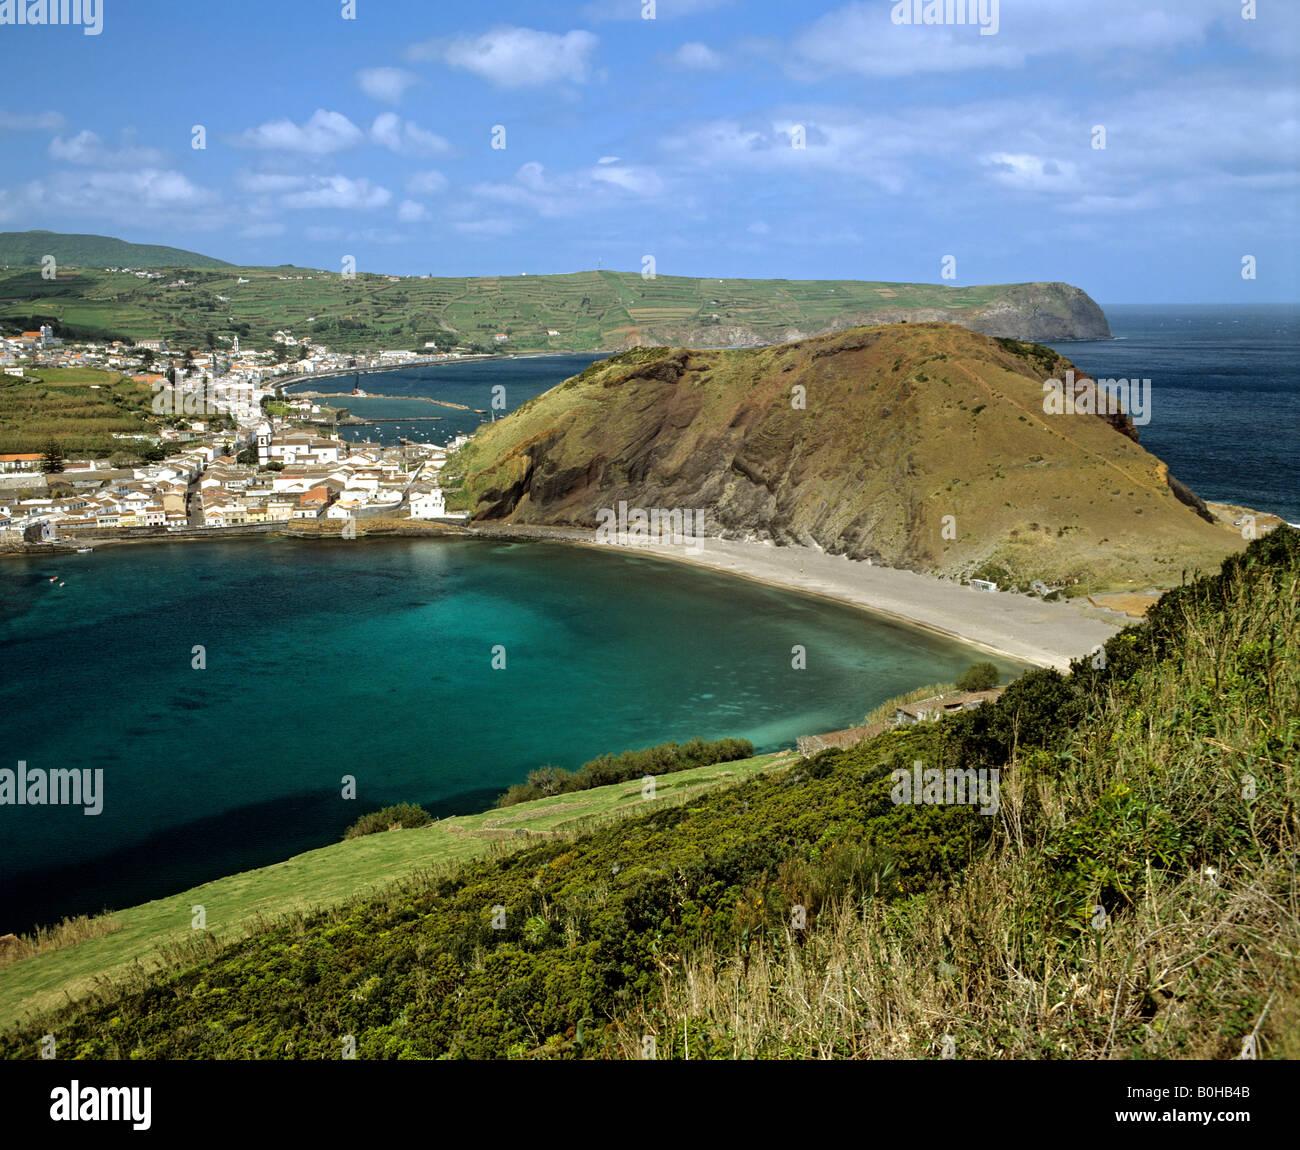 Horta on Faial Island, Azores, Portugal - Stock Image